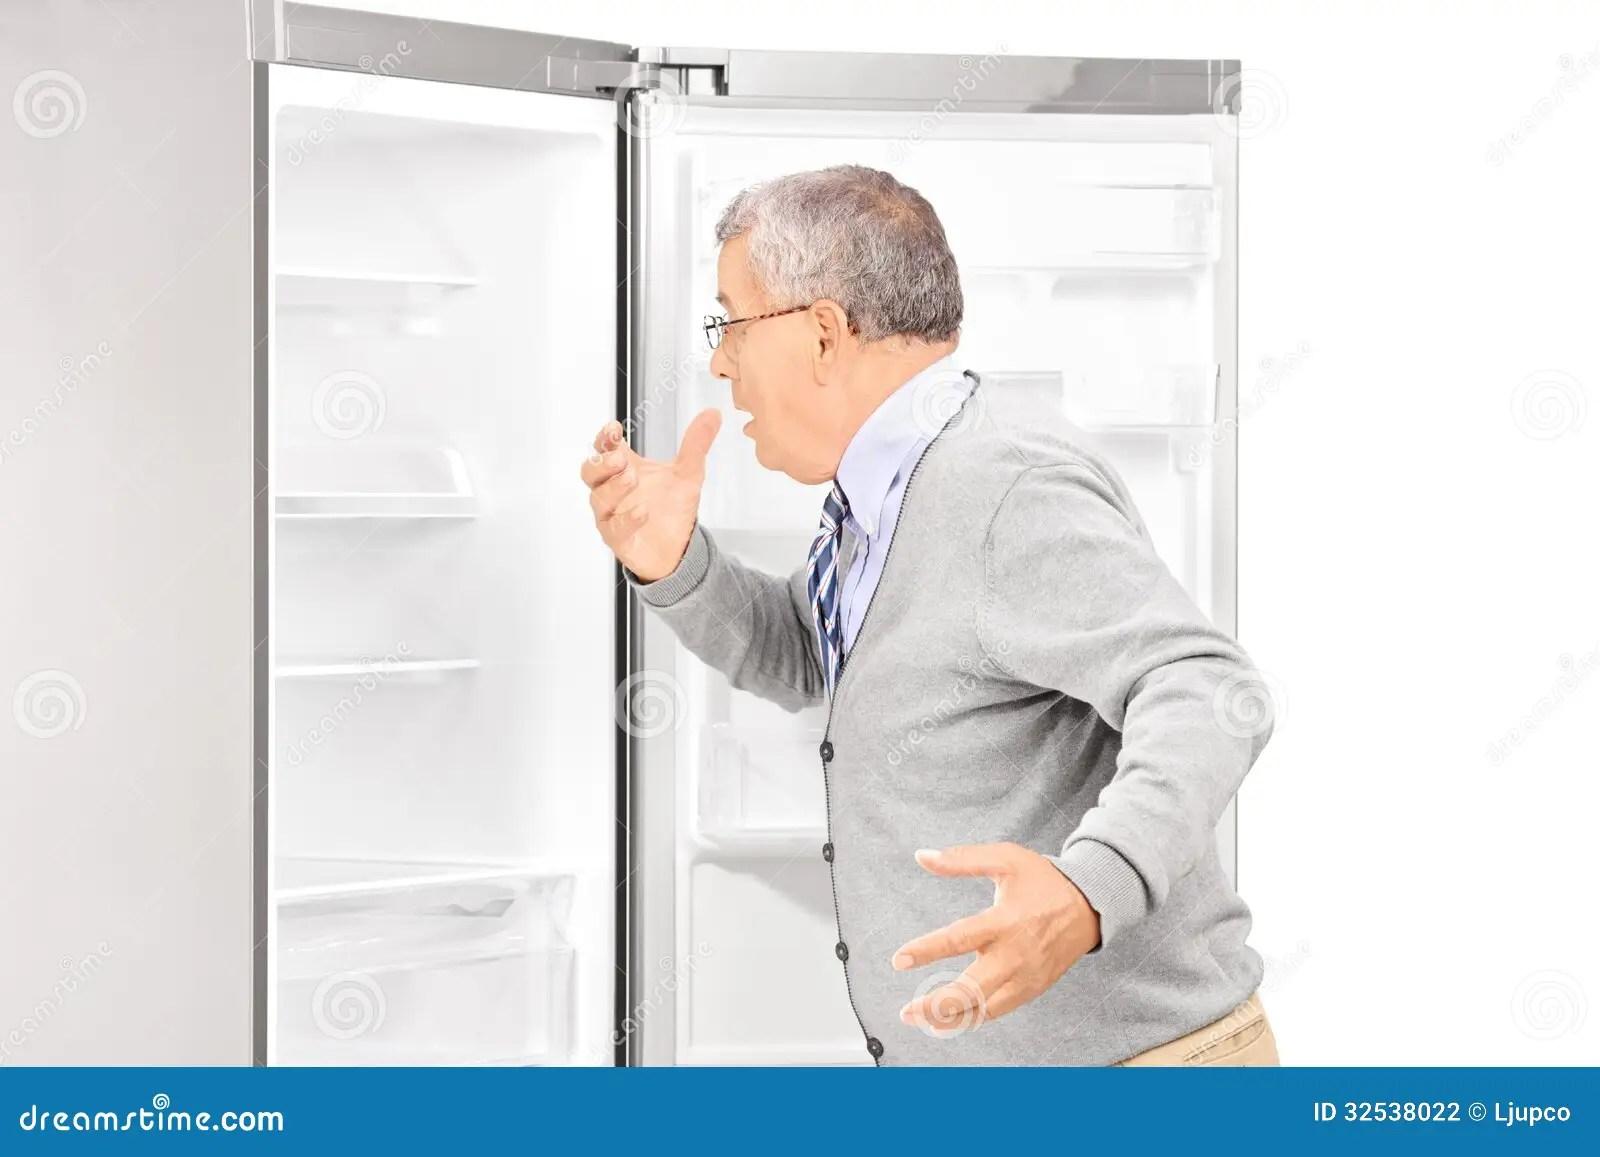 Shocked Mature Man Looking In Empty Fridge Stock